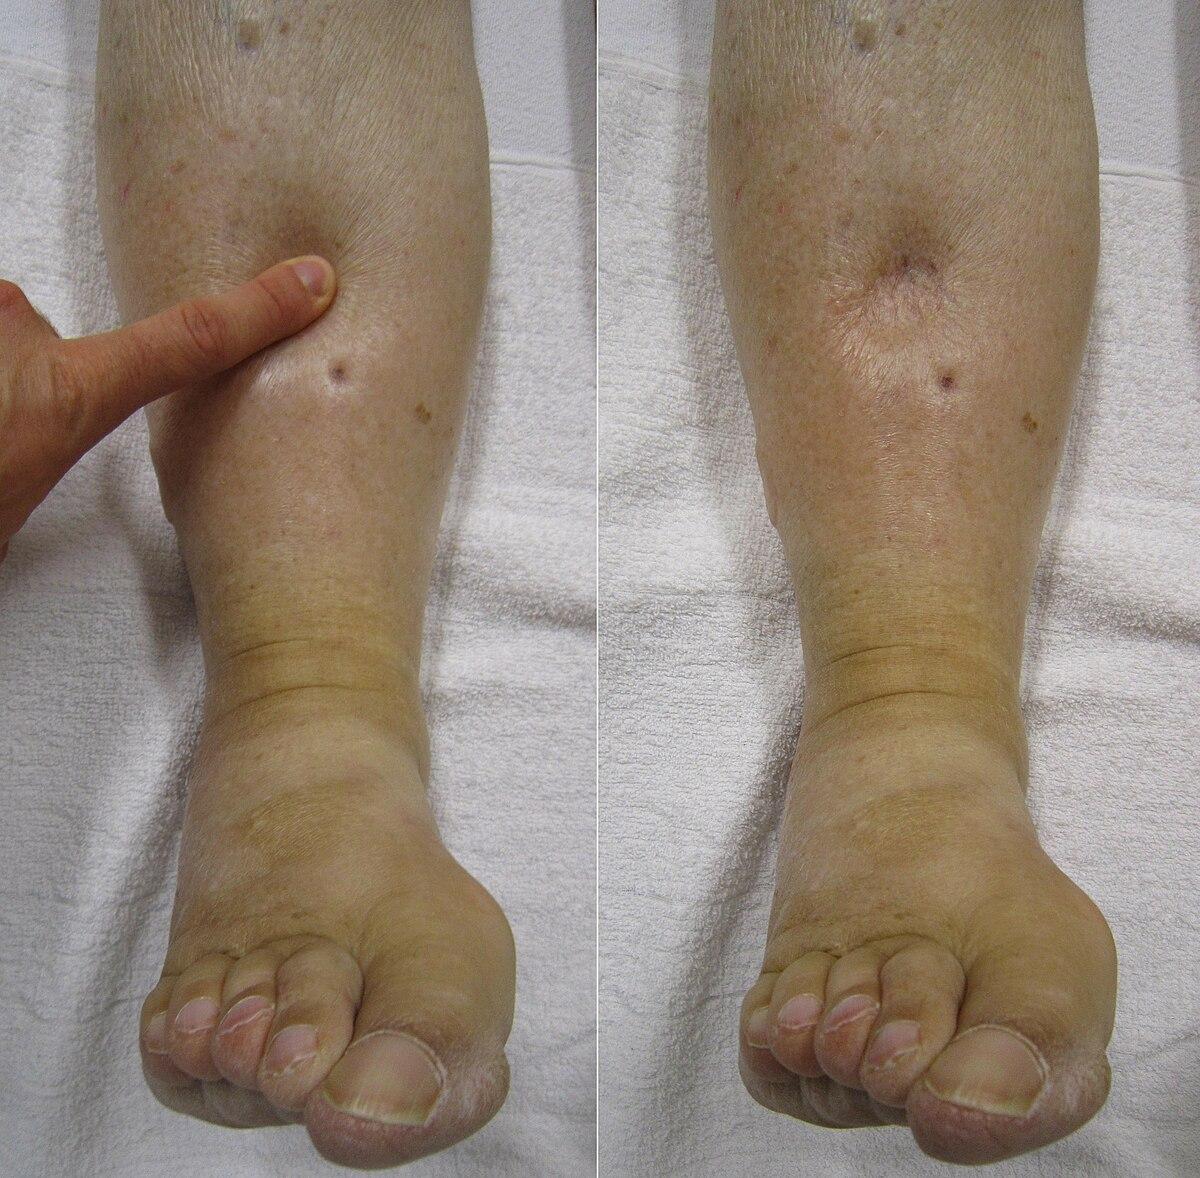 papiloame simple dermatita seboreica